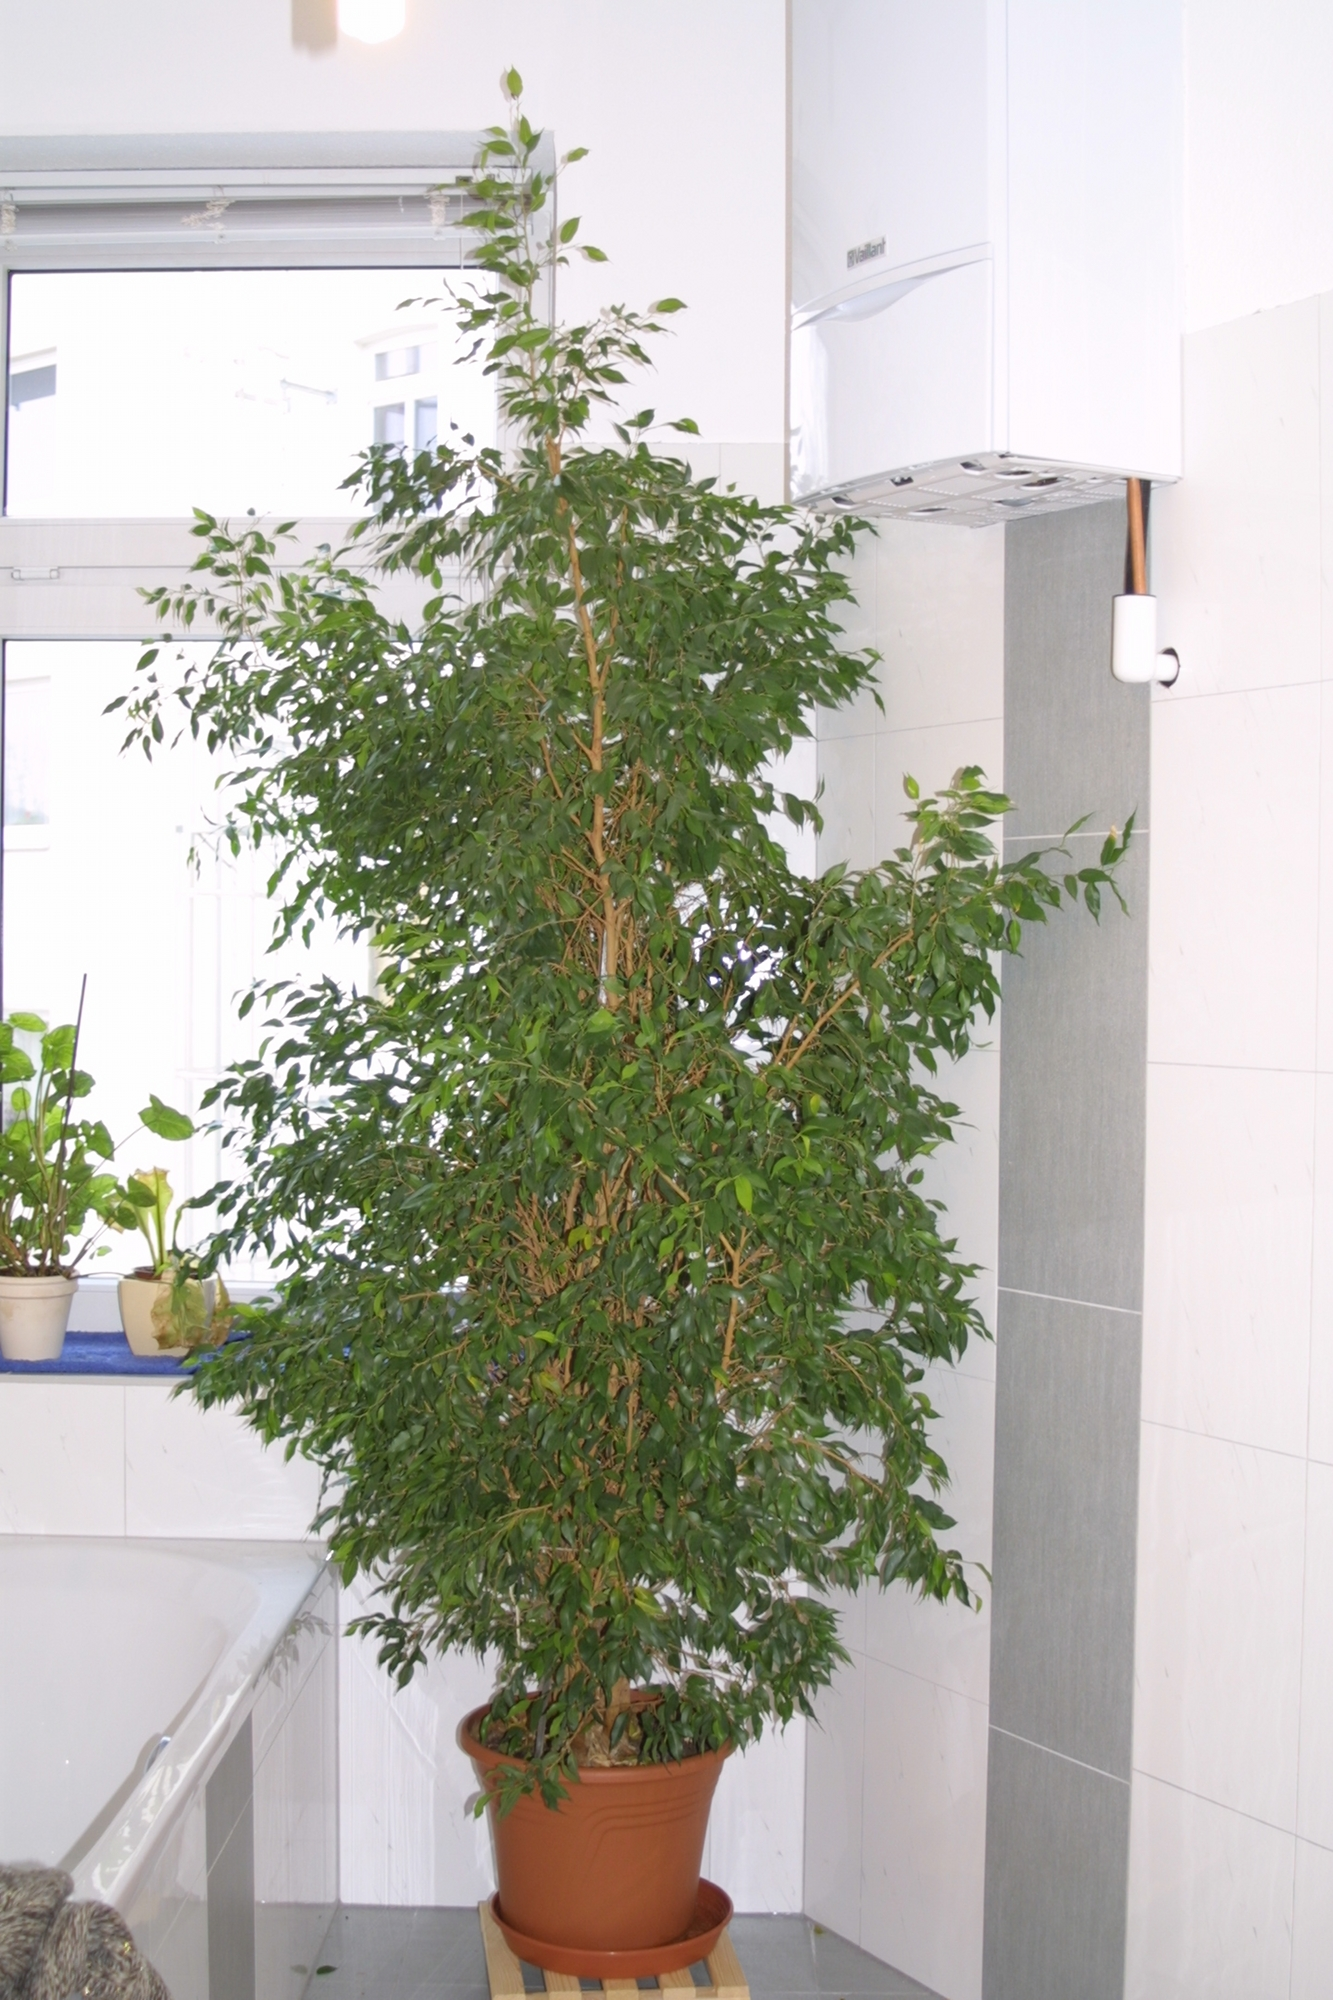 ficus benjamini birkenfeige pflanzen botanik green24 hilfe pflege bilder. Black Bedroom Furniture Sets. Home Design Ideas